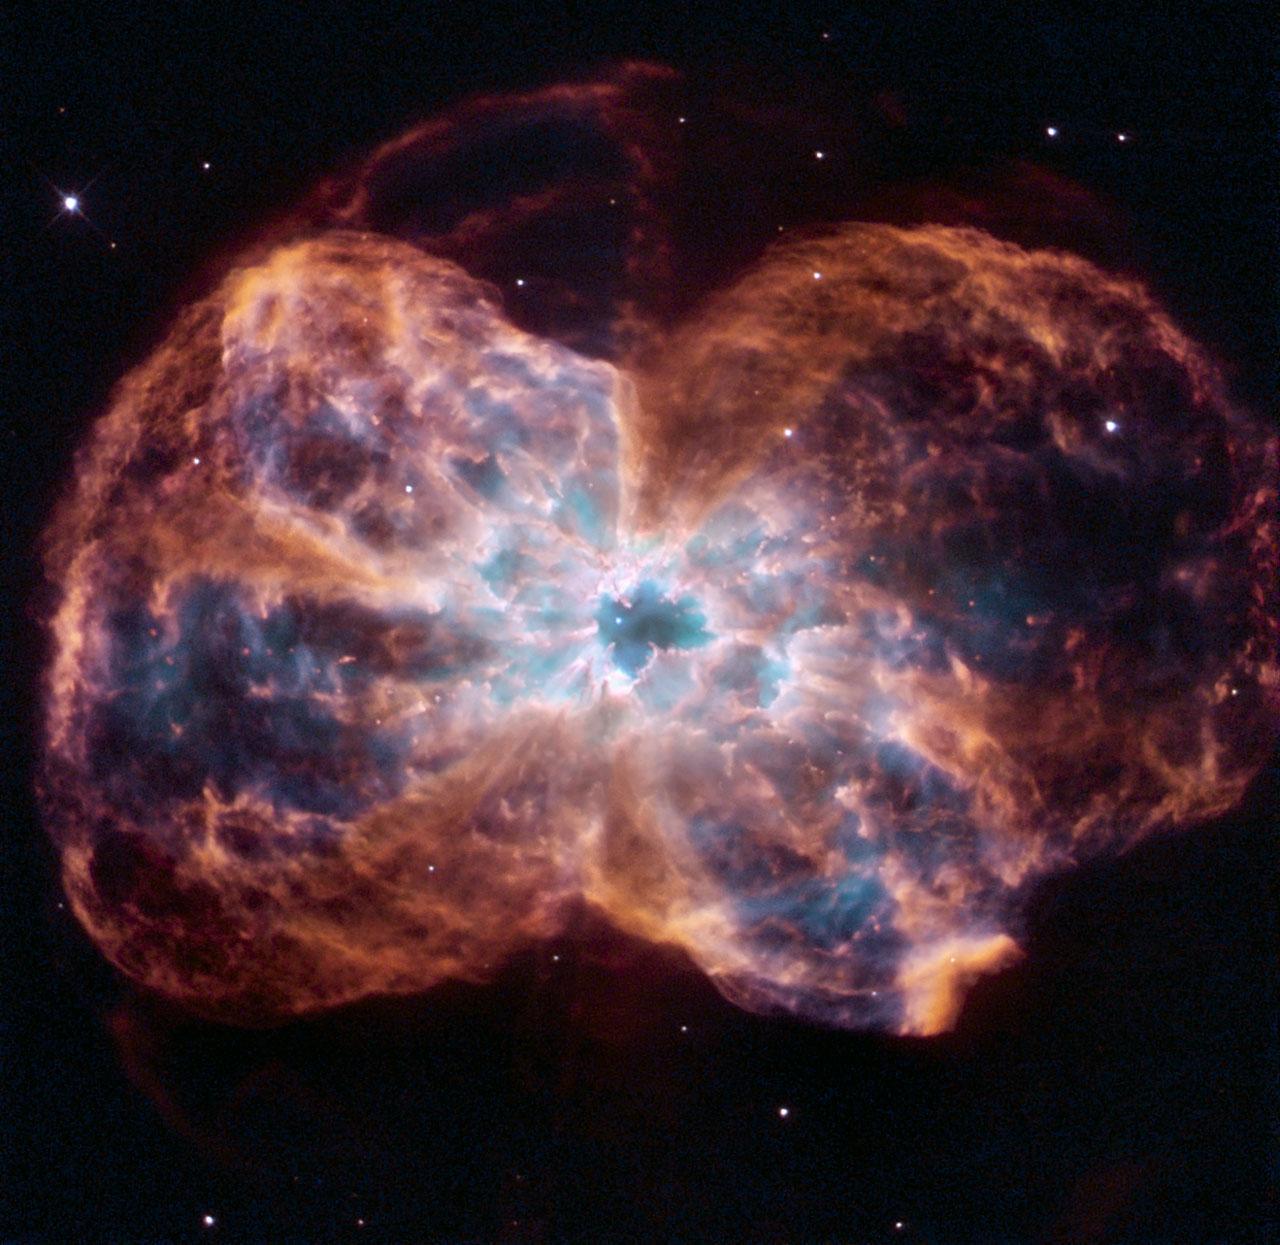 La nébuleuse NGC 2440